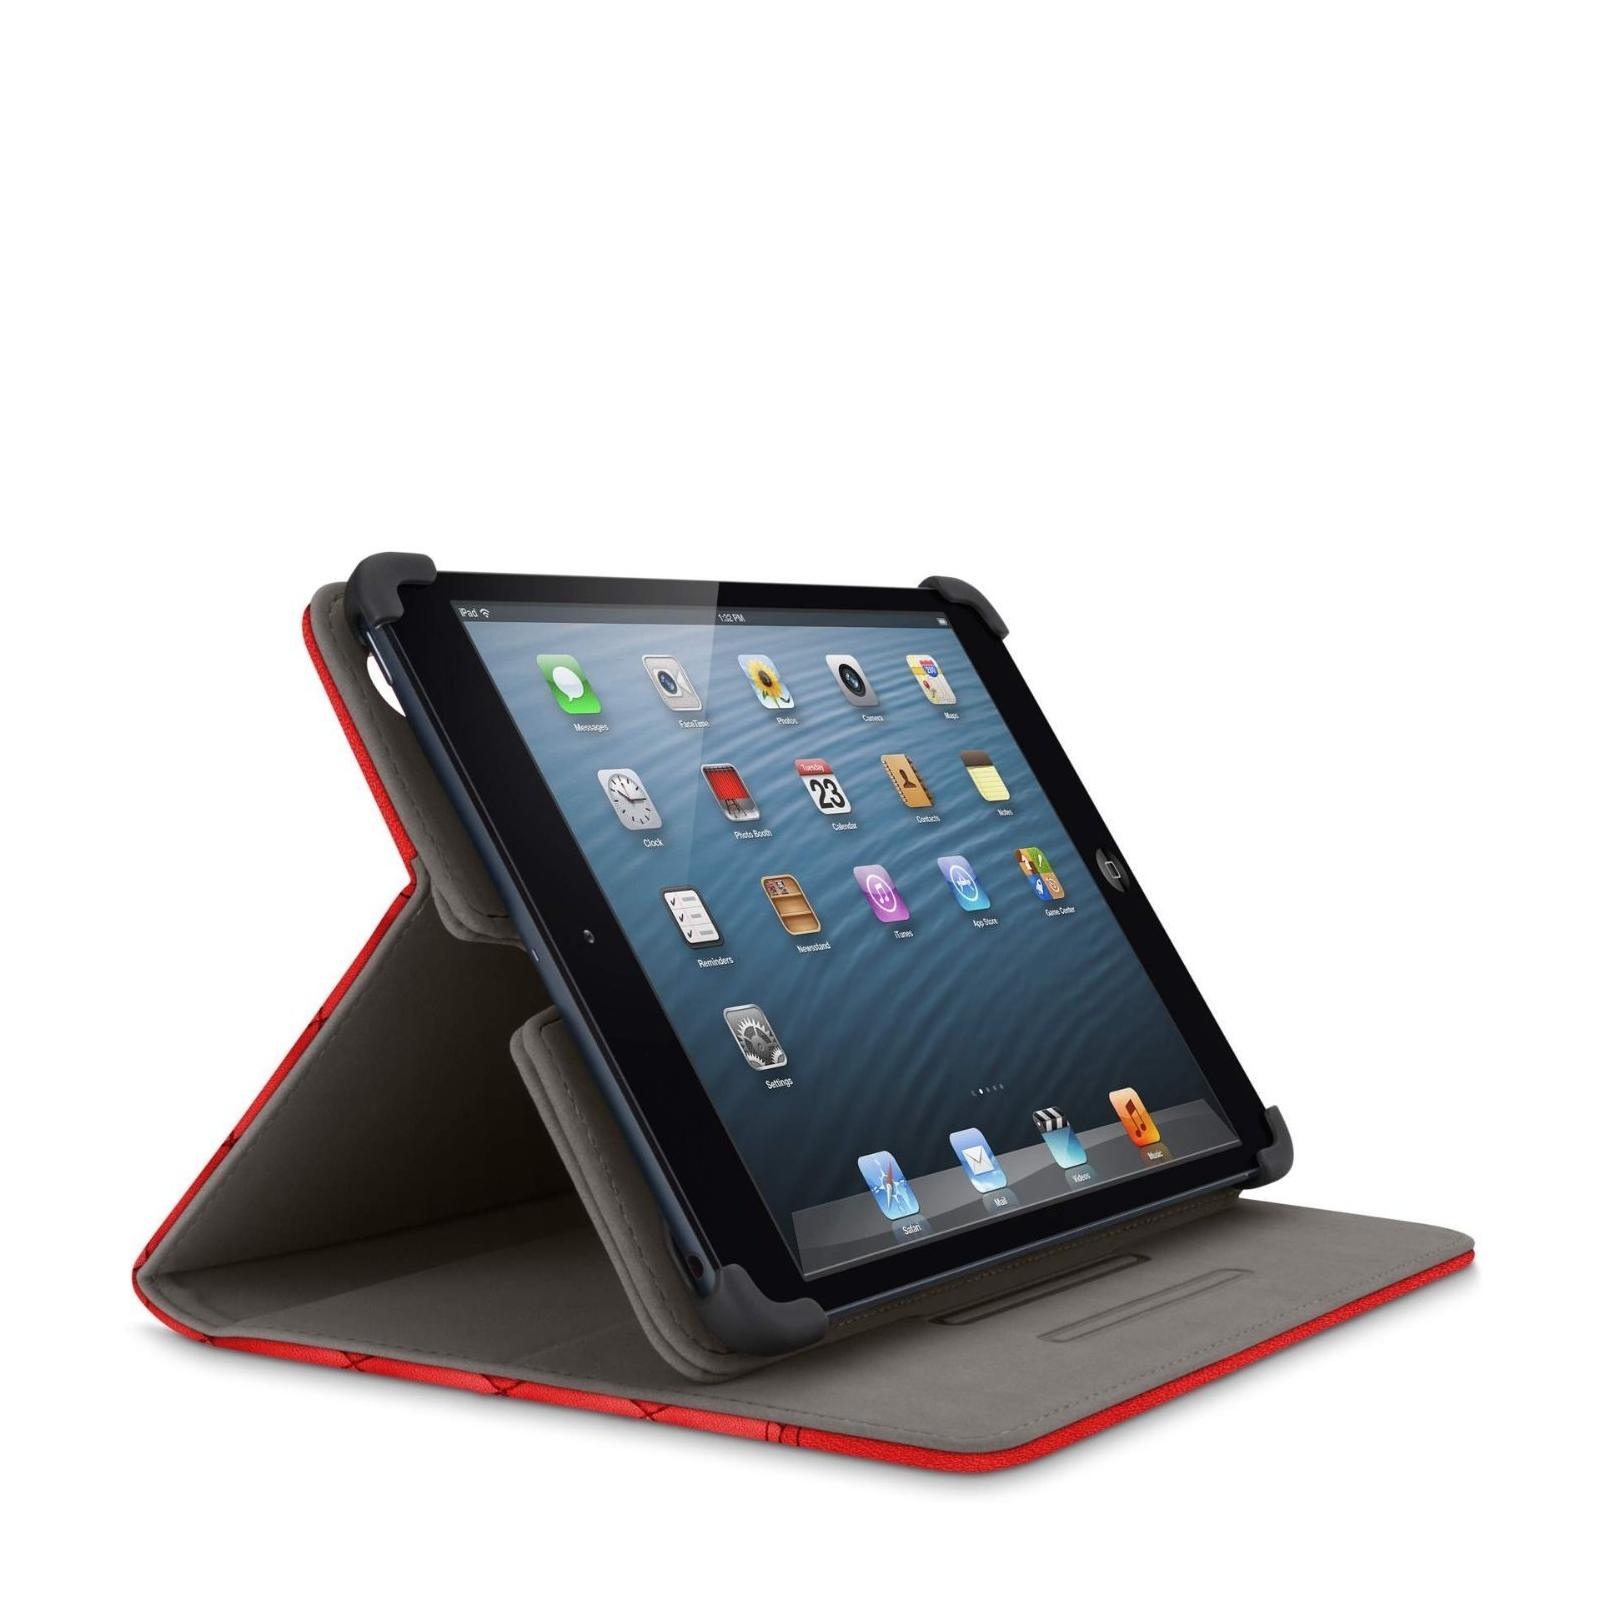 Чехол для планшета Belkin iPad Air Quilted Cover /Ruby (F7N073B2C02) изображение 3